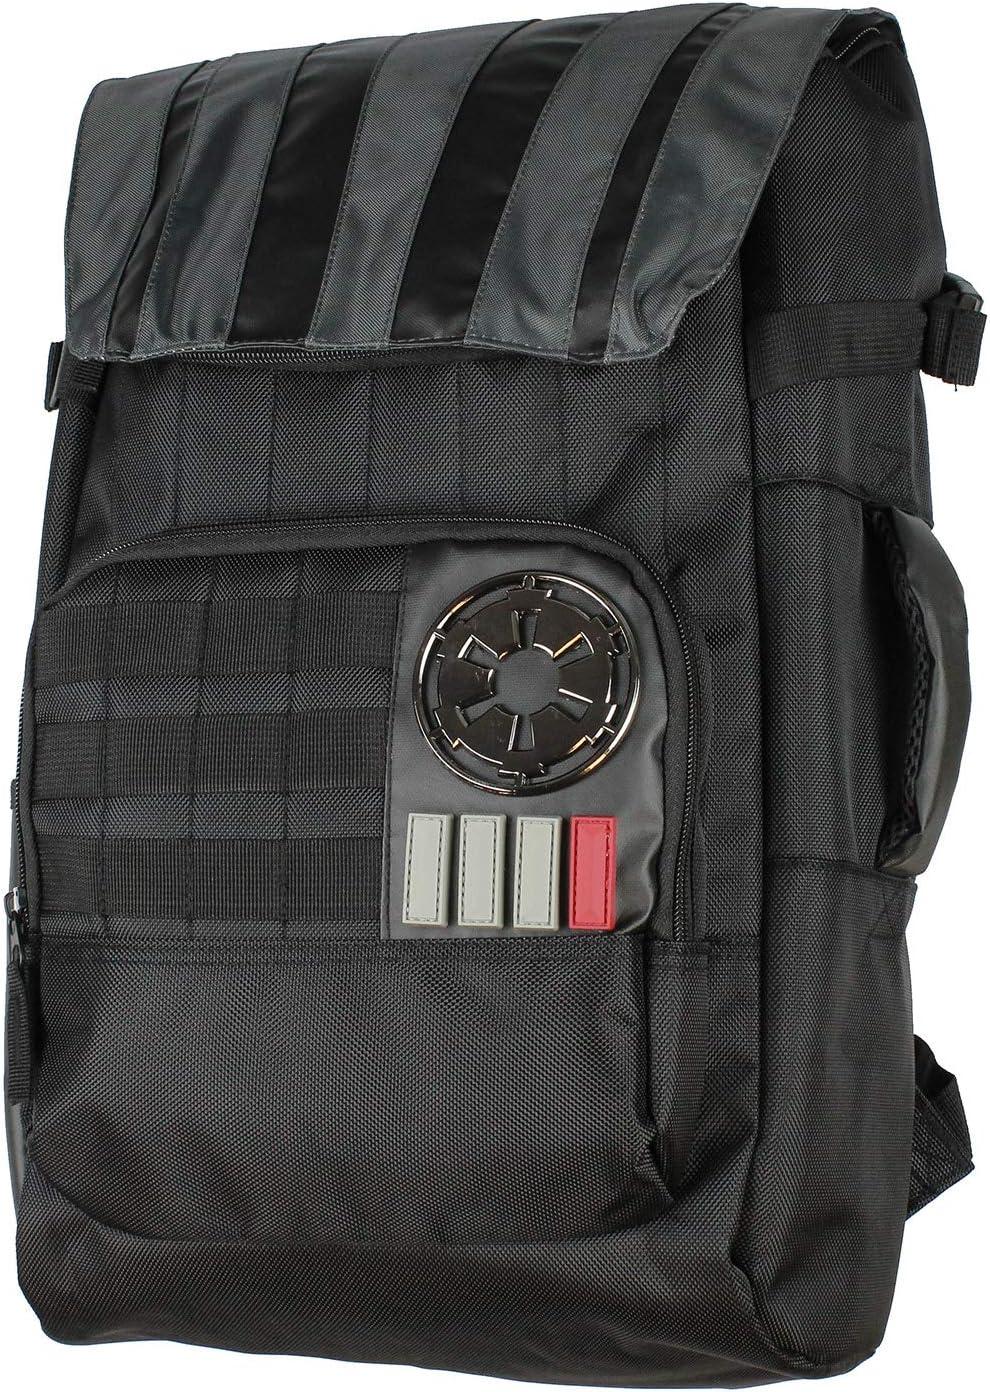 Star Wars Darth Vader Costume Inspired Bag Padded Sleeve Tech Laptop Backpack